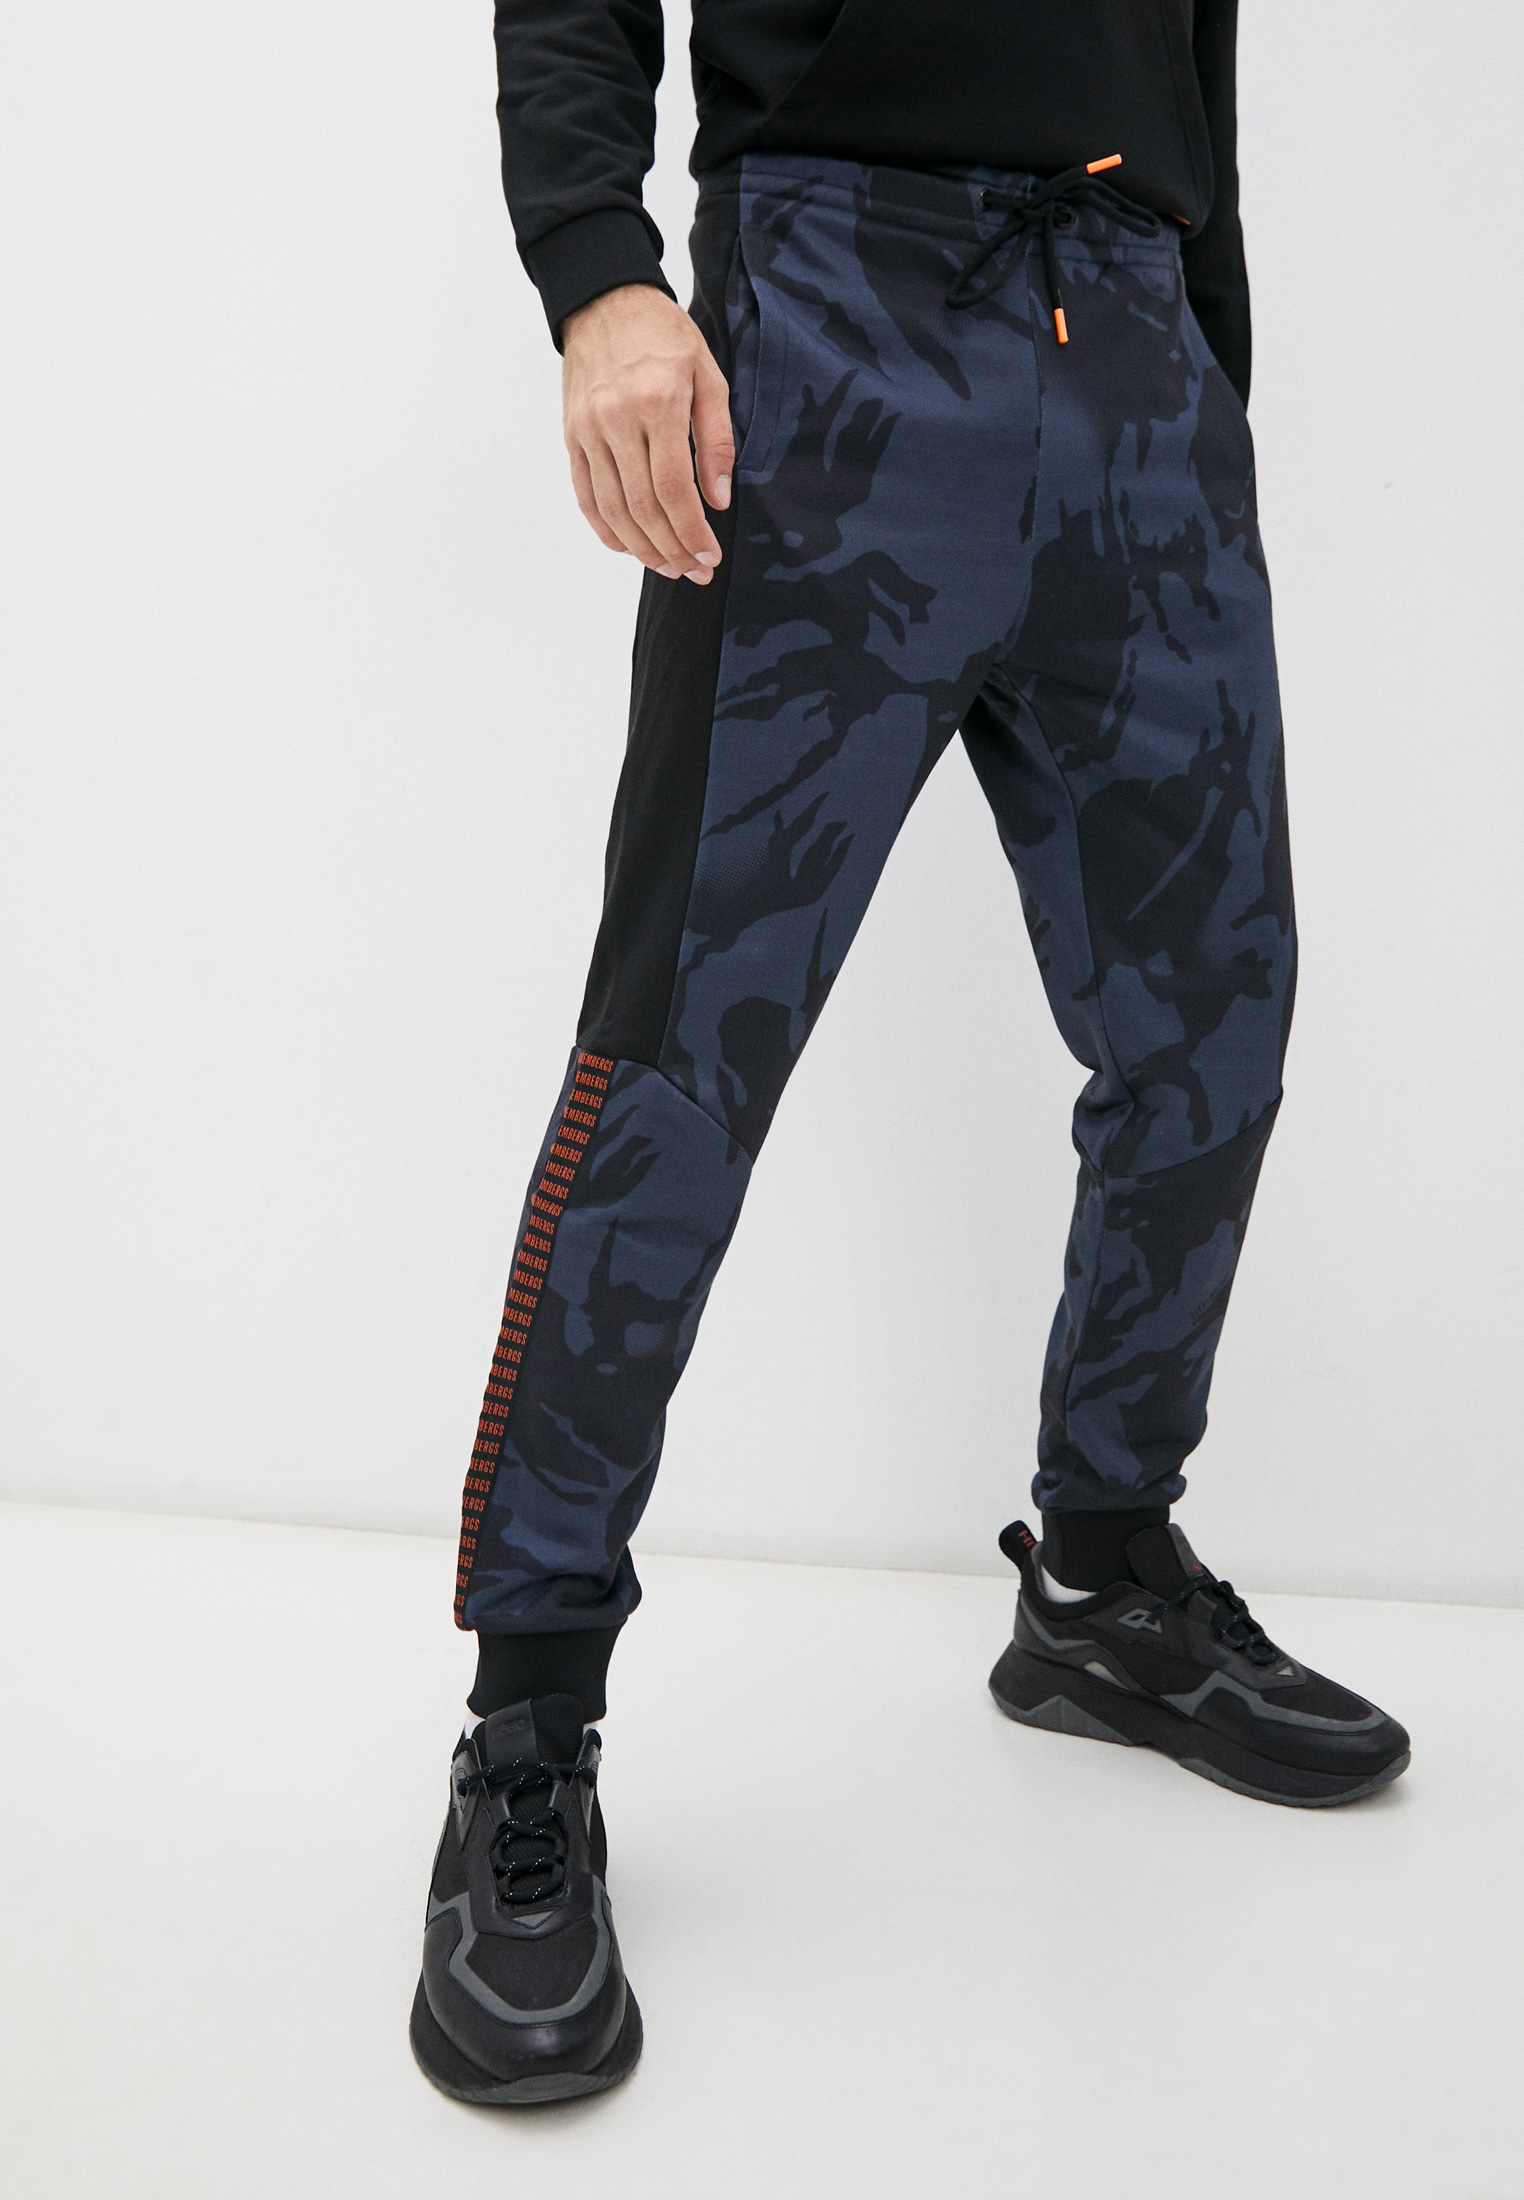 Мужские спортивные брюки Bikkembergs (Биккембергс) C 1 163 80 M 4251